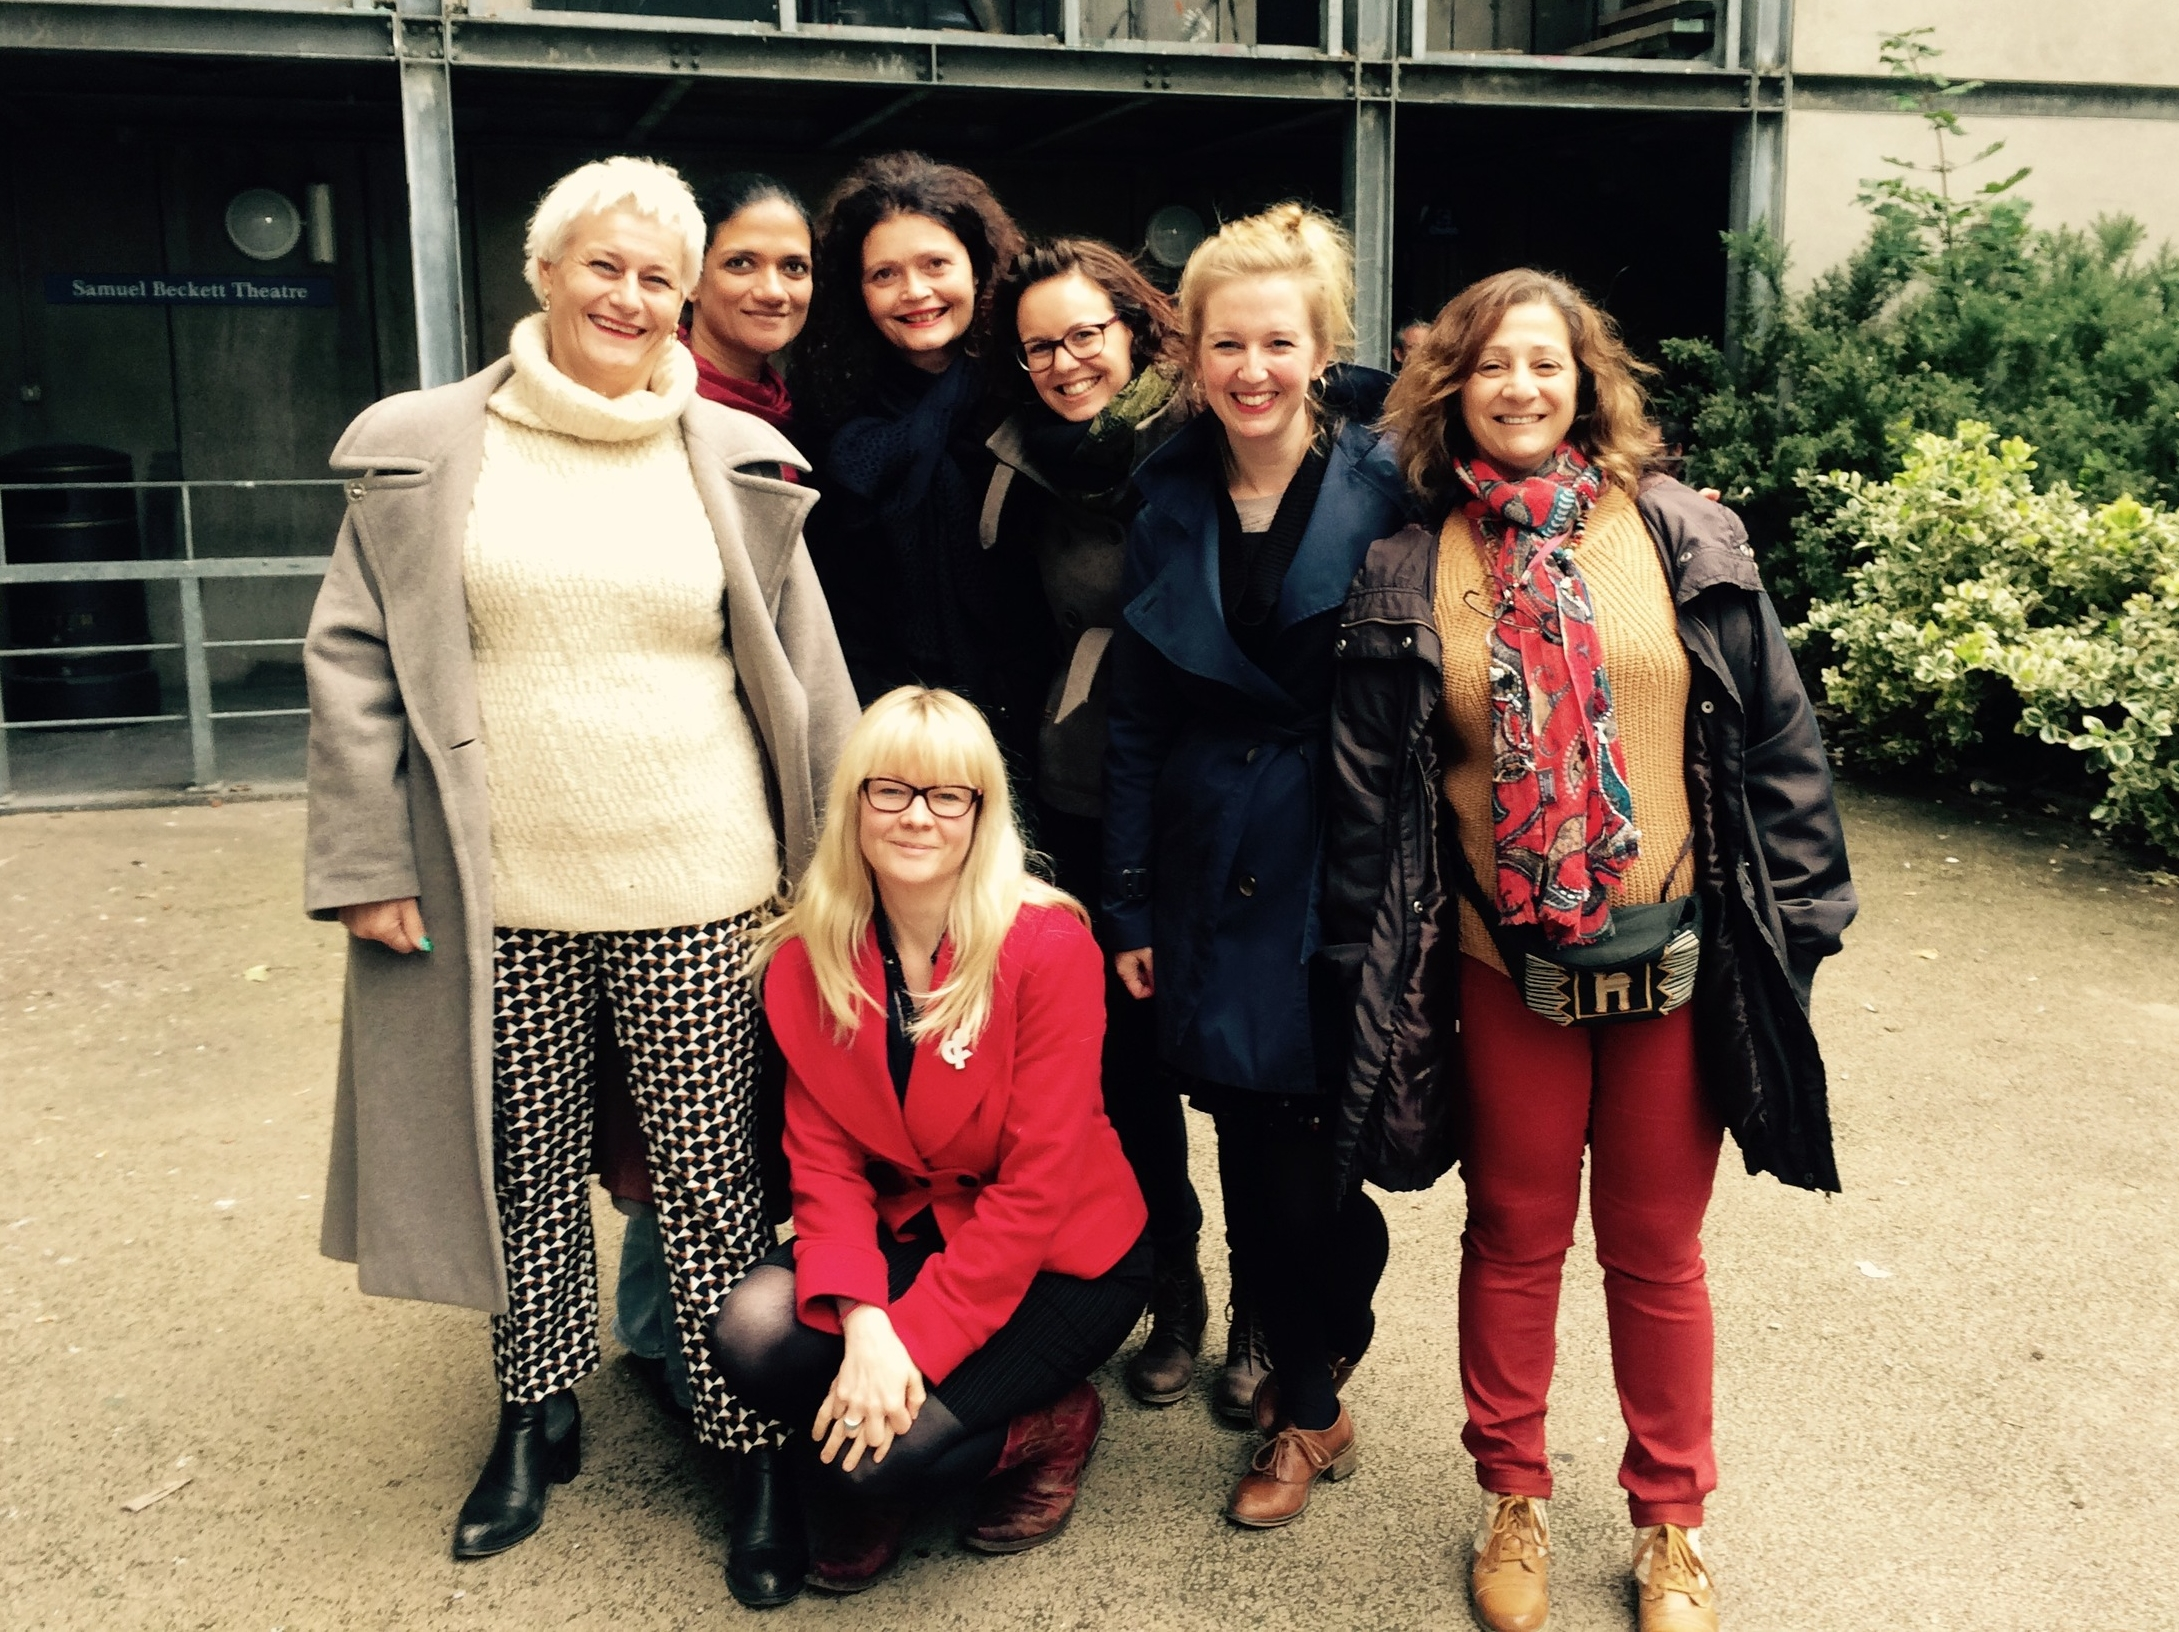 The ARIADNE women at the The Nest, Samuel Beckett Centre Dublin, September 2015  (L-R) Frédérique LeComte, Ruwanthie de Chickera, Dijana Milosevic, Carmel England, Solène Marié,Susannah Tresilian and Iman Aoun.